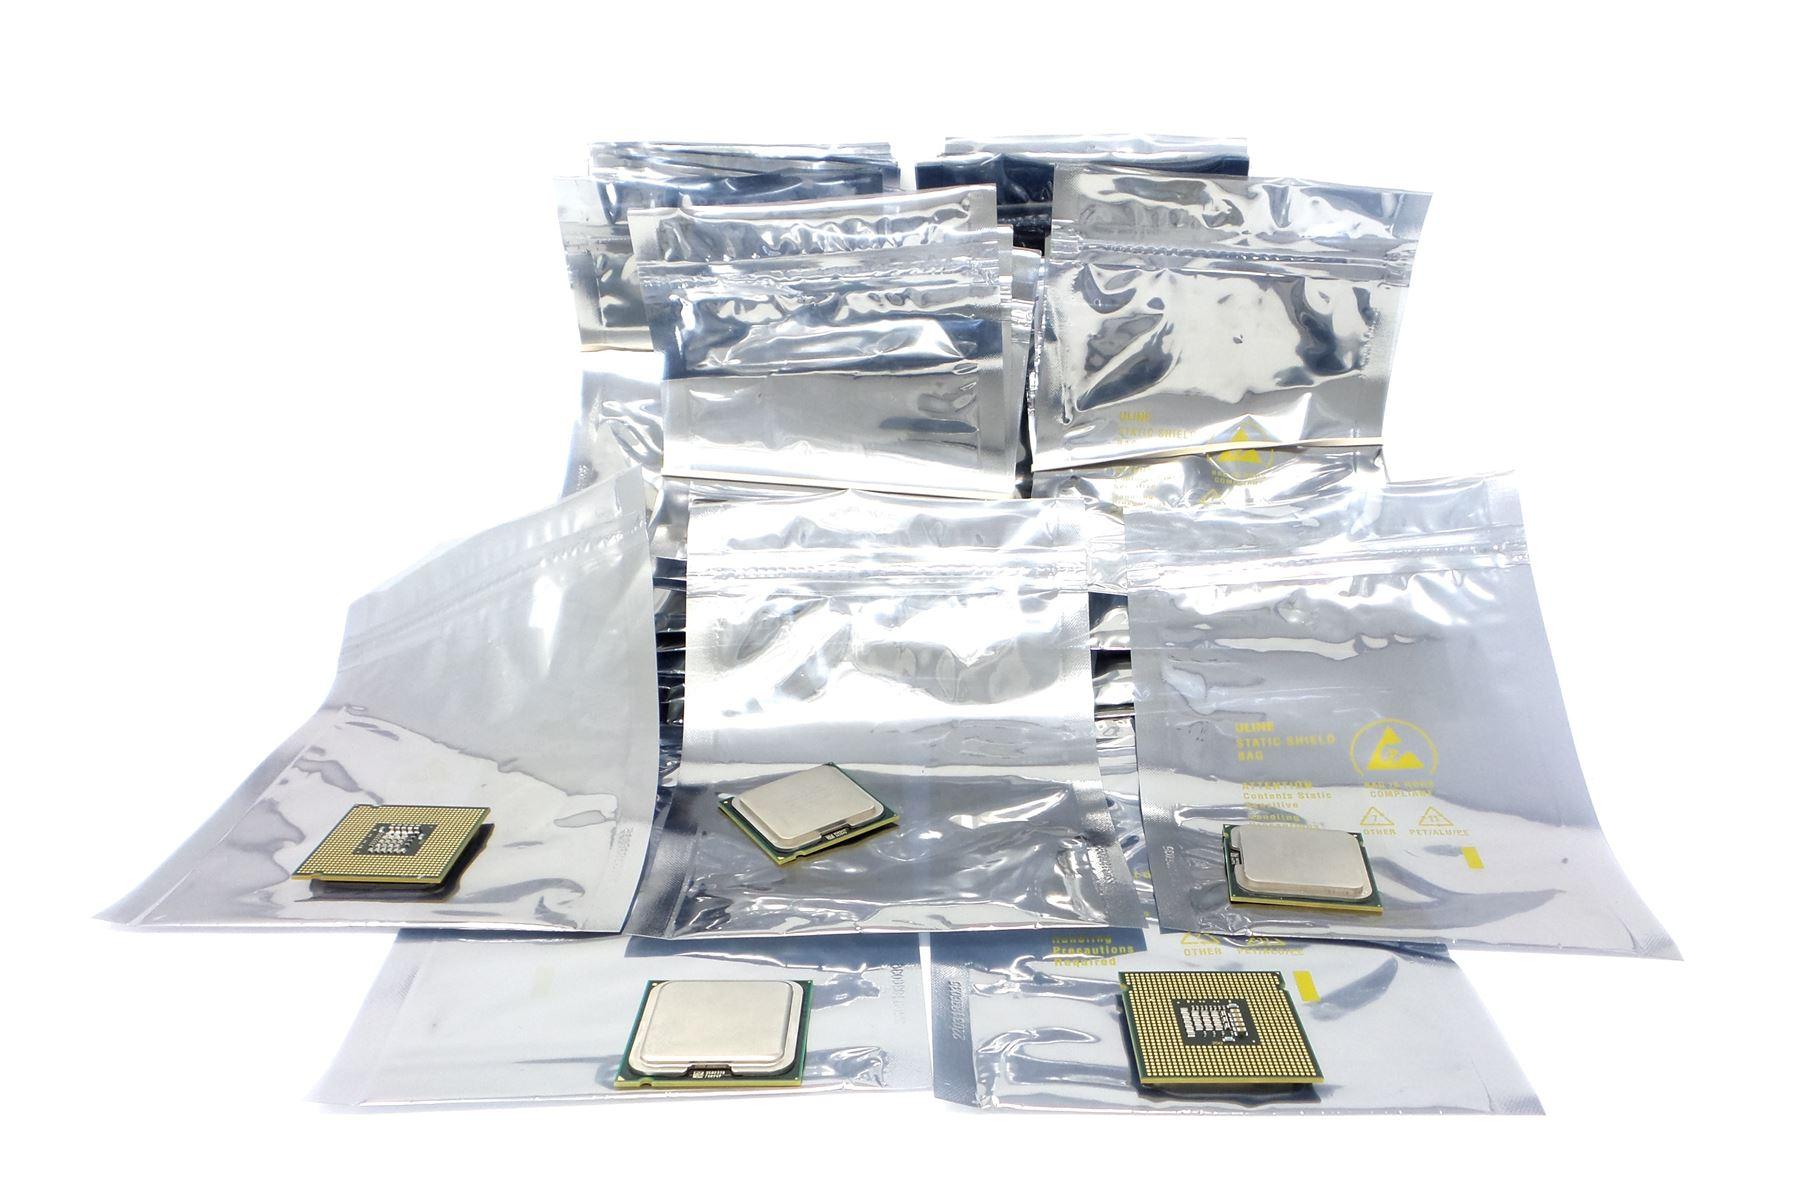 Lot Of 85 Intel Core 2 Duo Dual Processor E8500 316ghz 6m 1333mhz Prosesor Slb9k Lga775